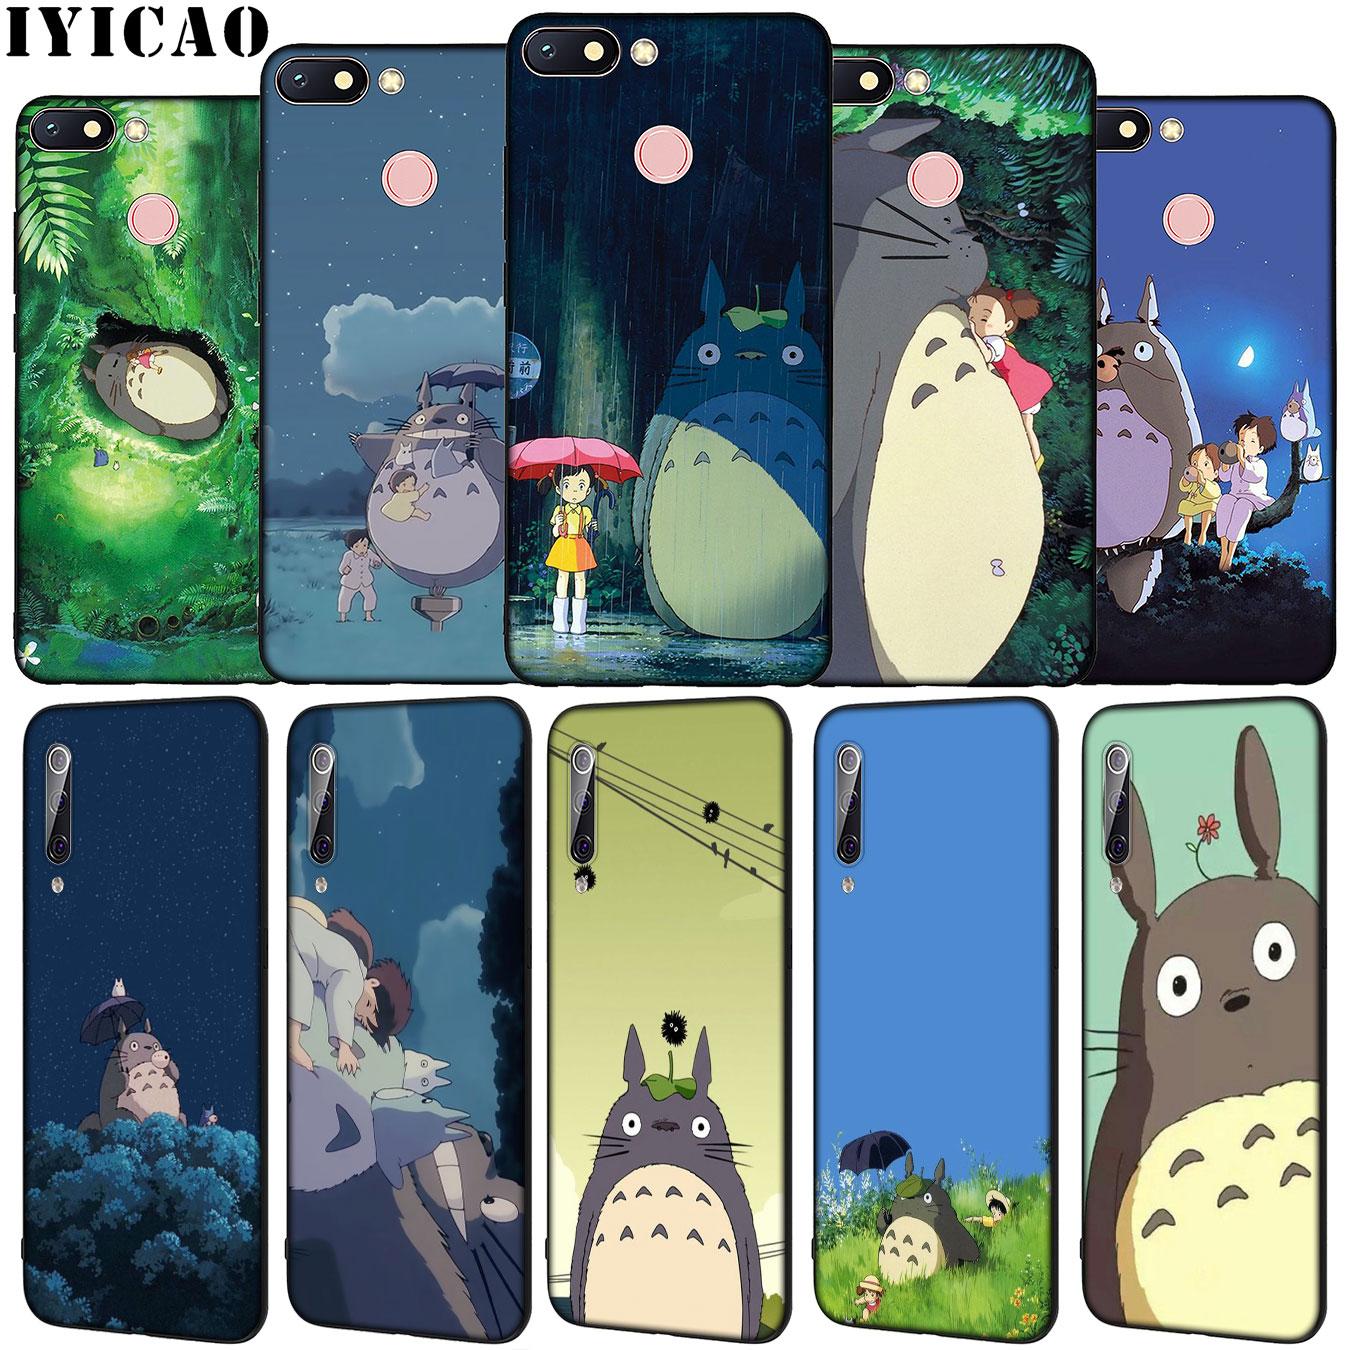 IYICAO mi vecino Totoro de silicona suave funda de teléfono para Xiaomi Redmi Note 8 8T 8A 7 7A 6 6A 5 5A ir S2 K30 K20 Pro cubierta negro